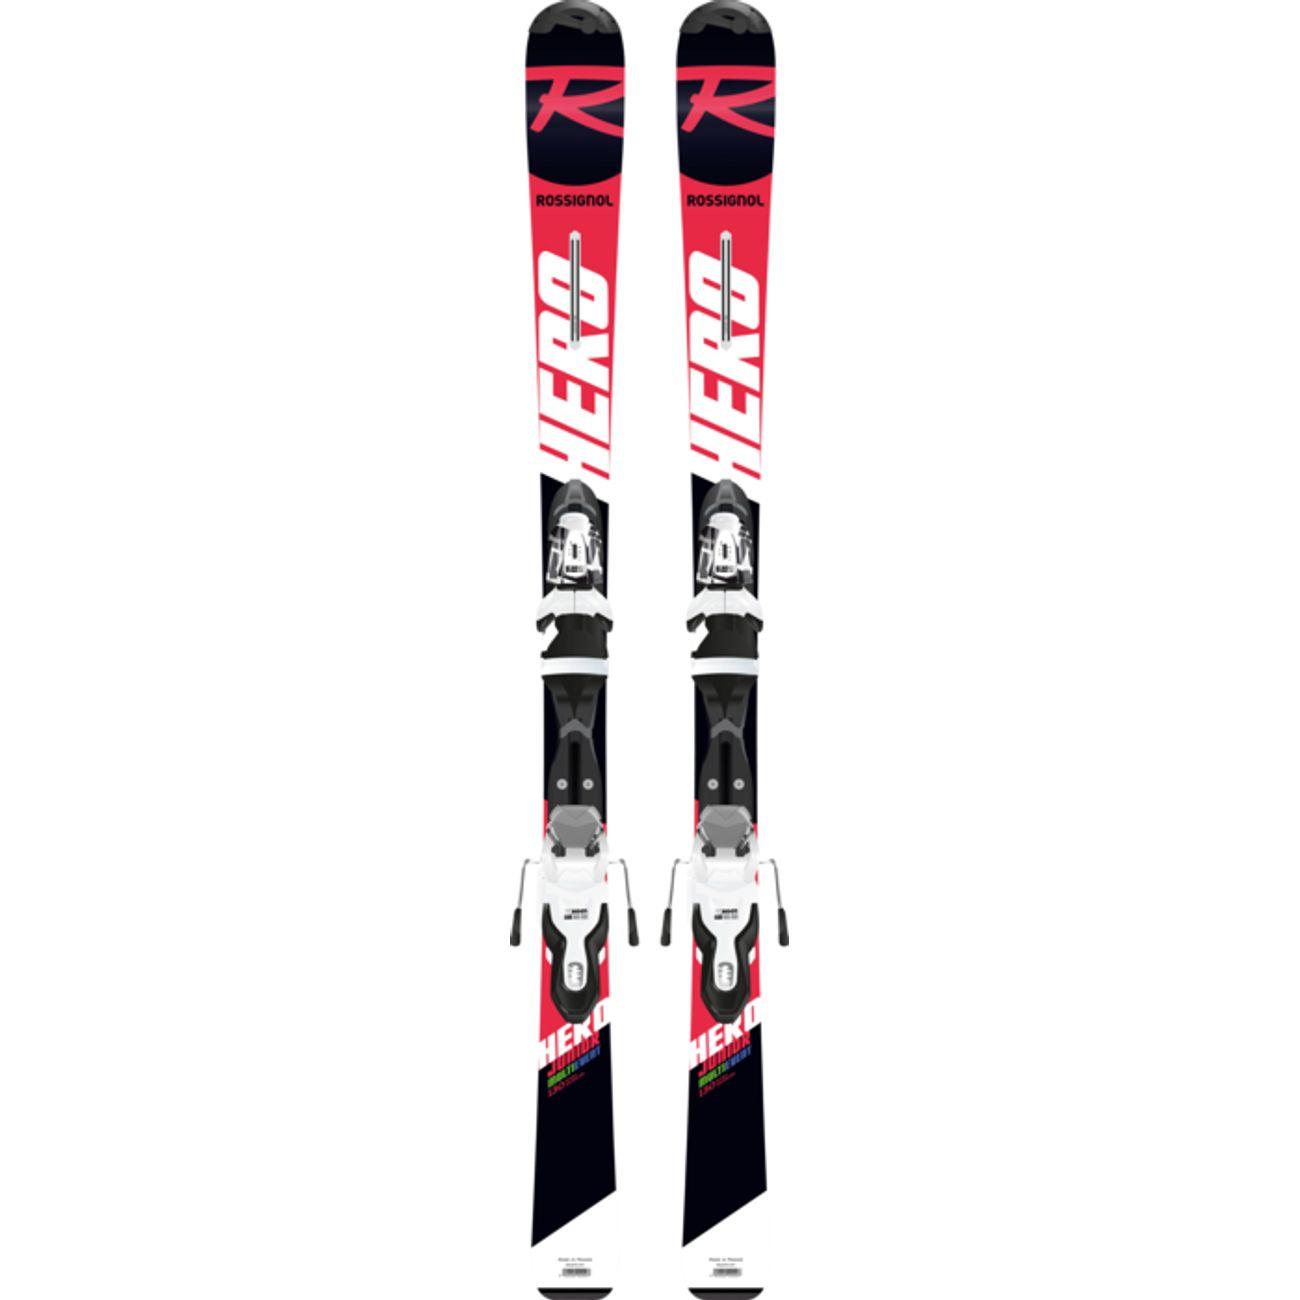 PLANCHE Ski enfant ROSSIGNOL HERO (130-150) XPRESS 7 B83 B, 130